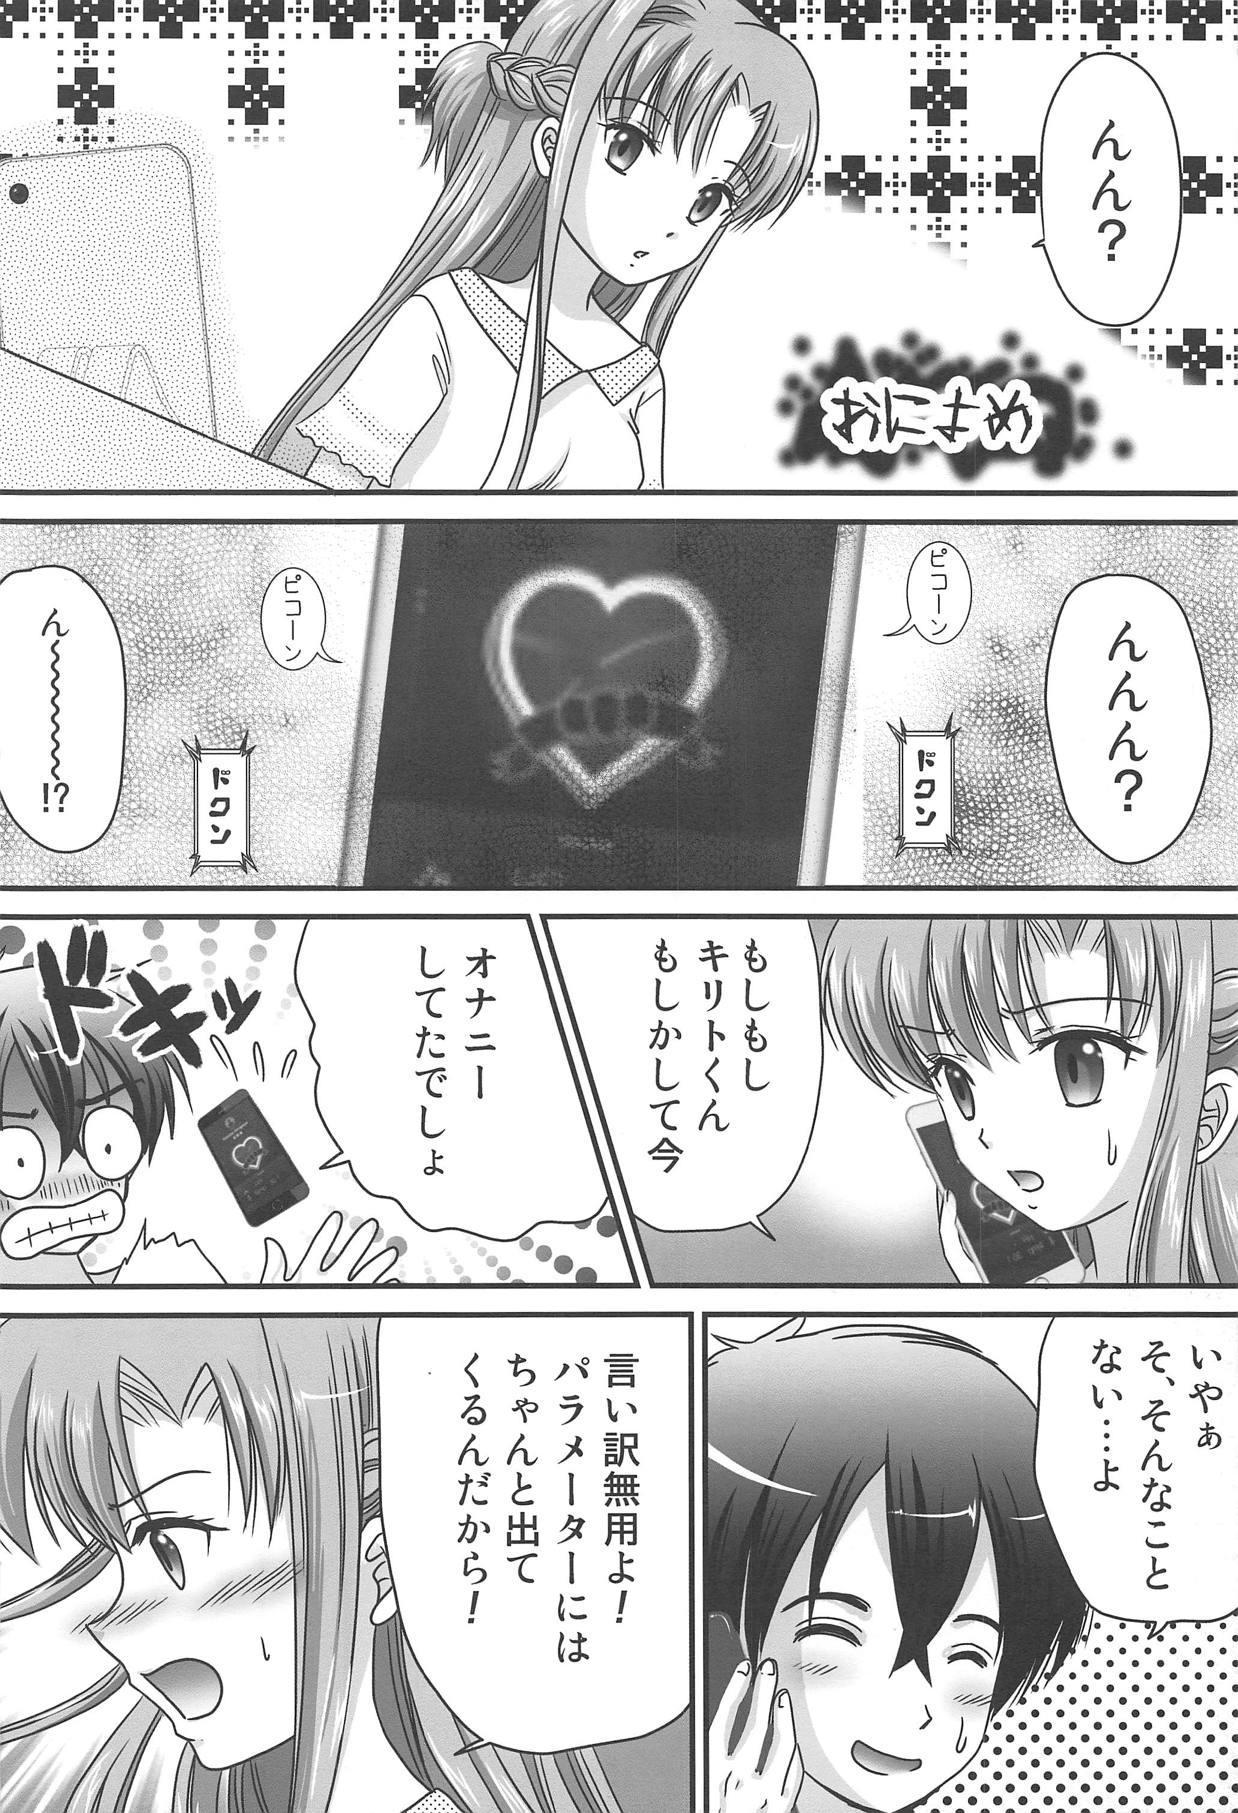 (C95) [TRAP (Urano Mami)] SAO ~sokoni anatato omoideto~ ETERNAL (Sword Art Online) 2